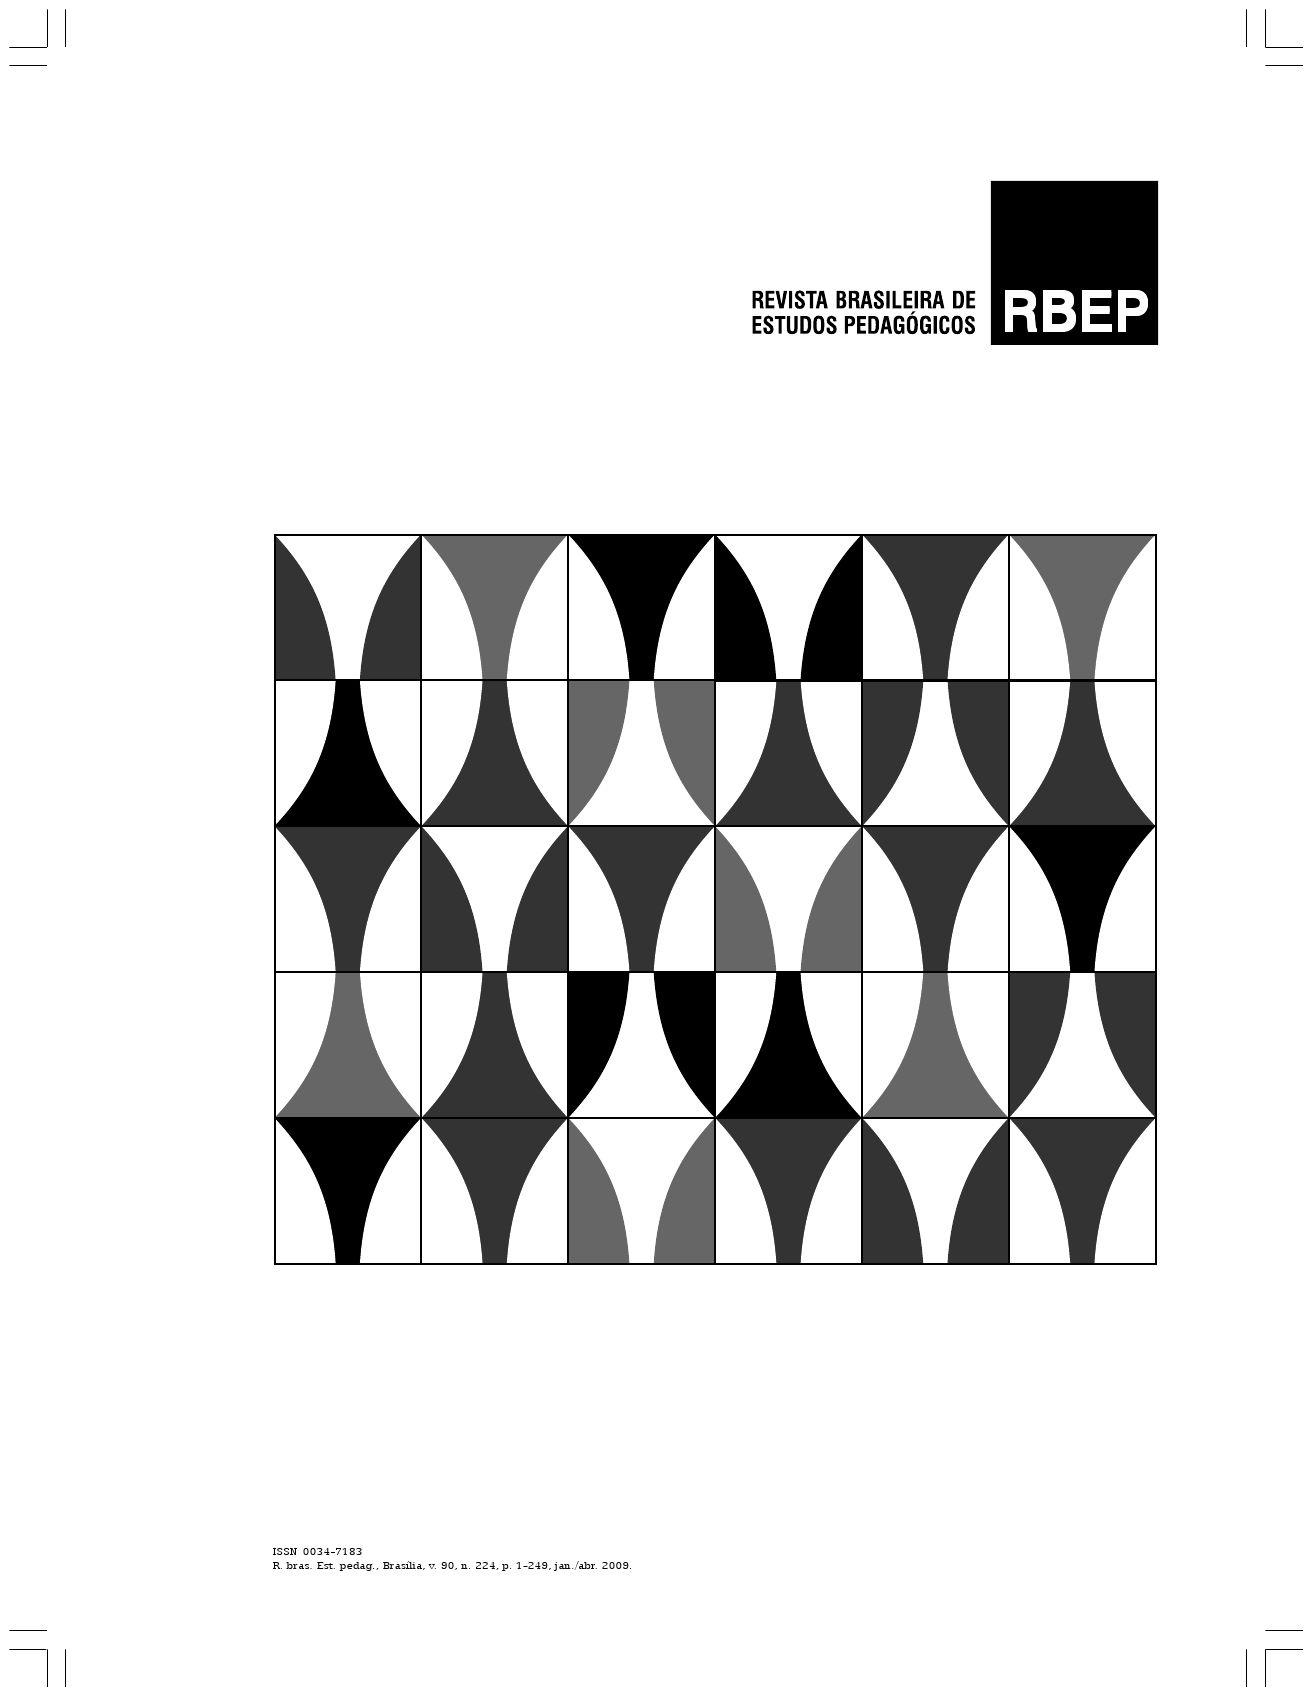 Rbep By Nailton Oliveira Issuu